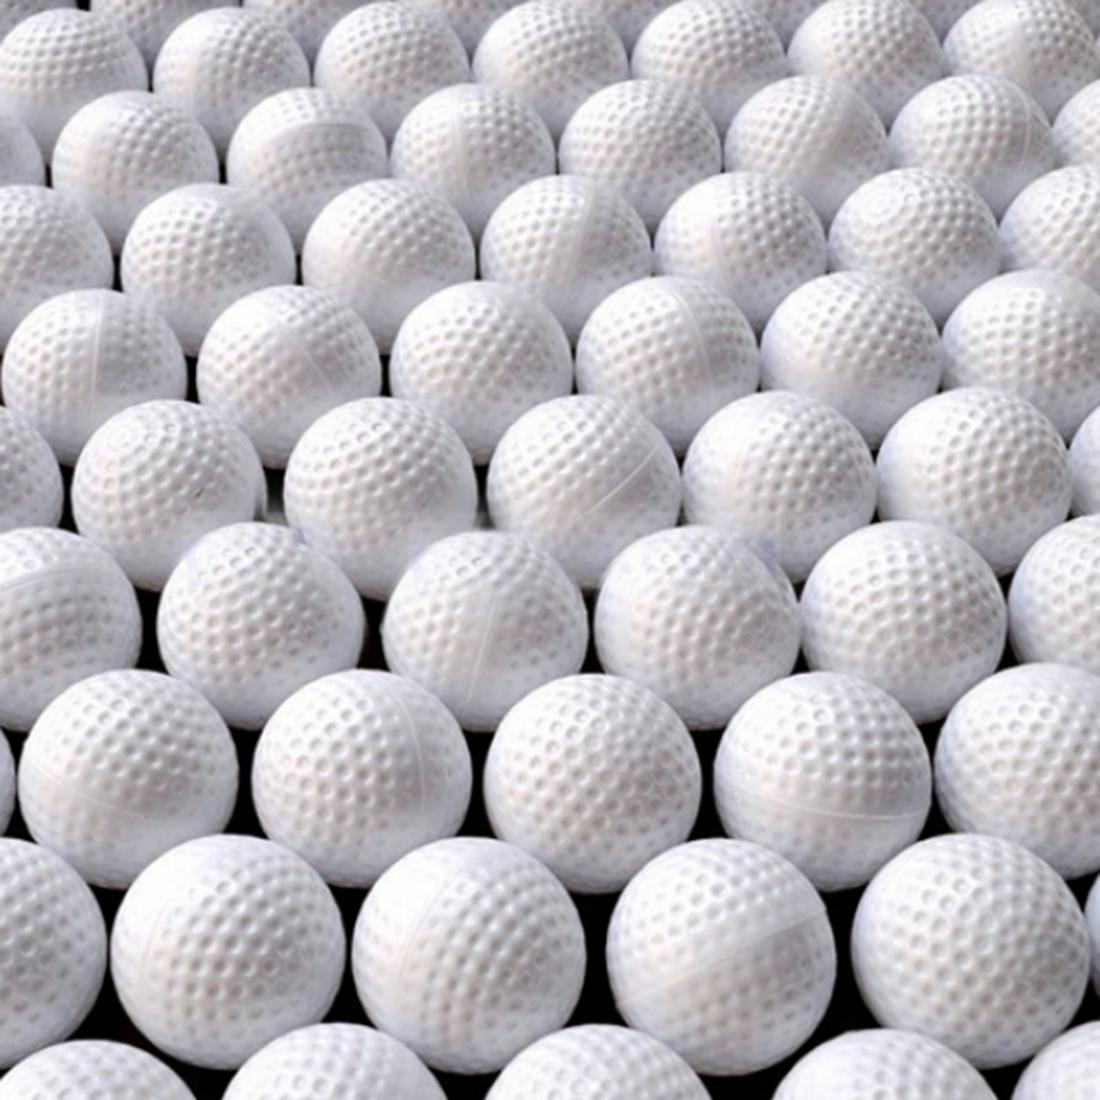 100Pcs Hollow Golf Balls Indoor Practice Training Balls Golf Training Aids Golf Accessories Outdoor Sports